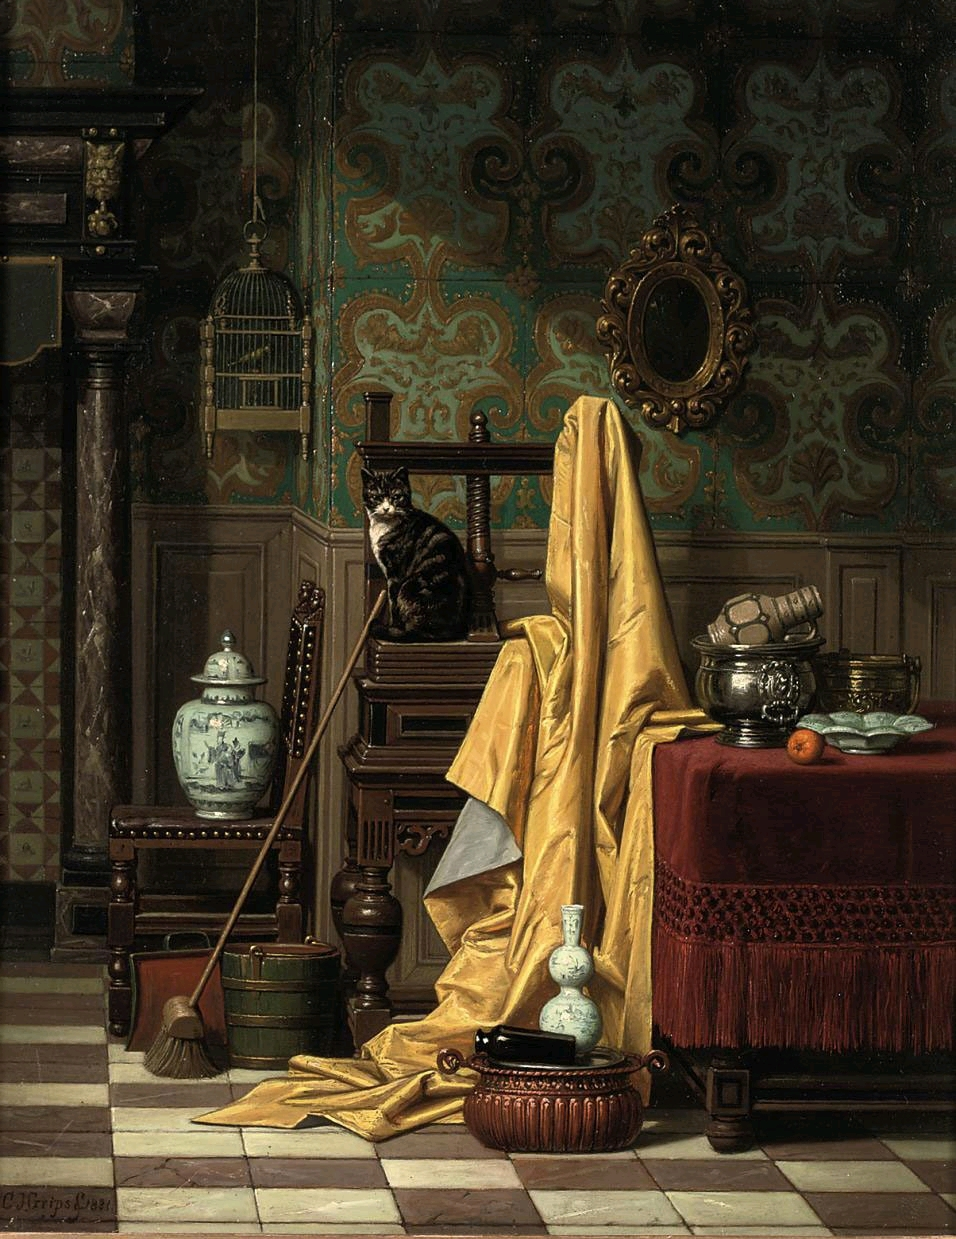 Charles_Joseph_Grips_-_A_Domestic_Interior,_1881